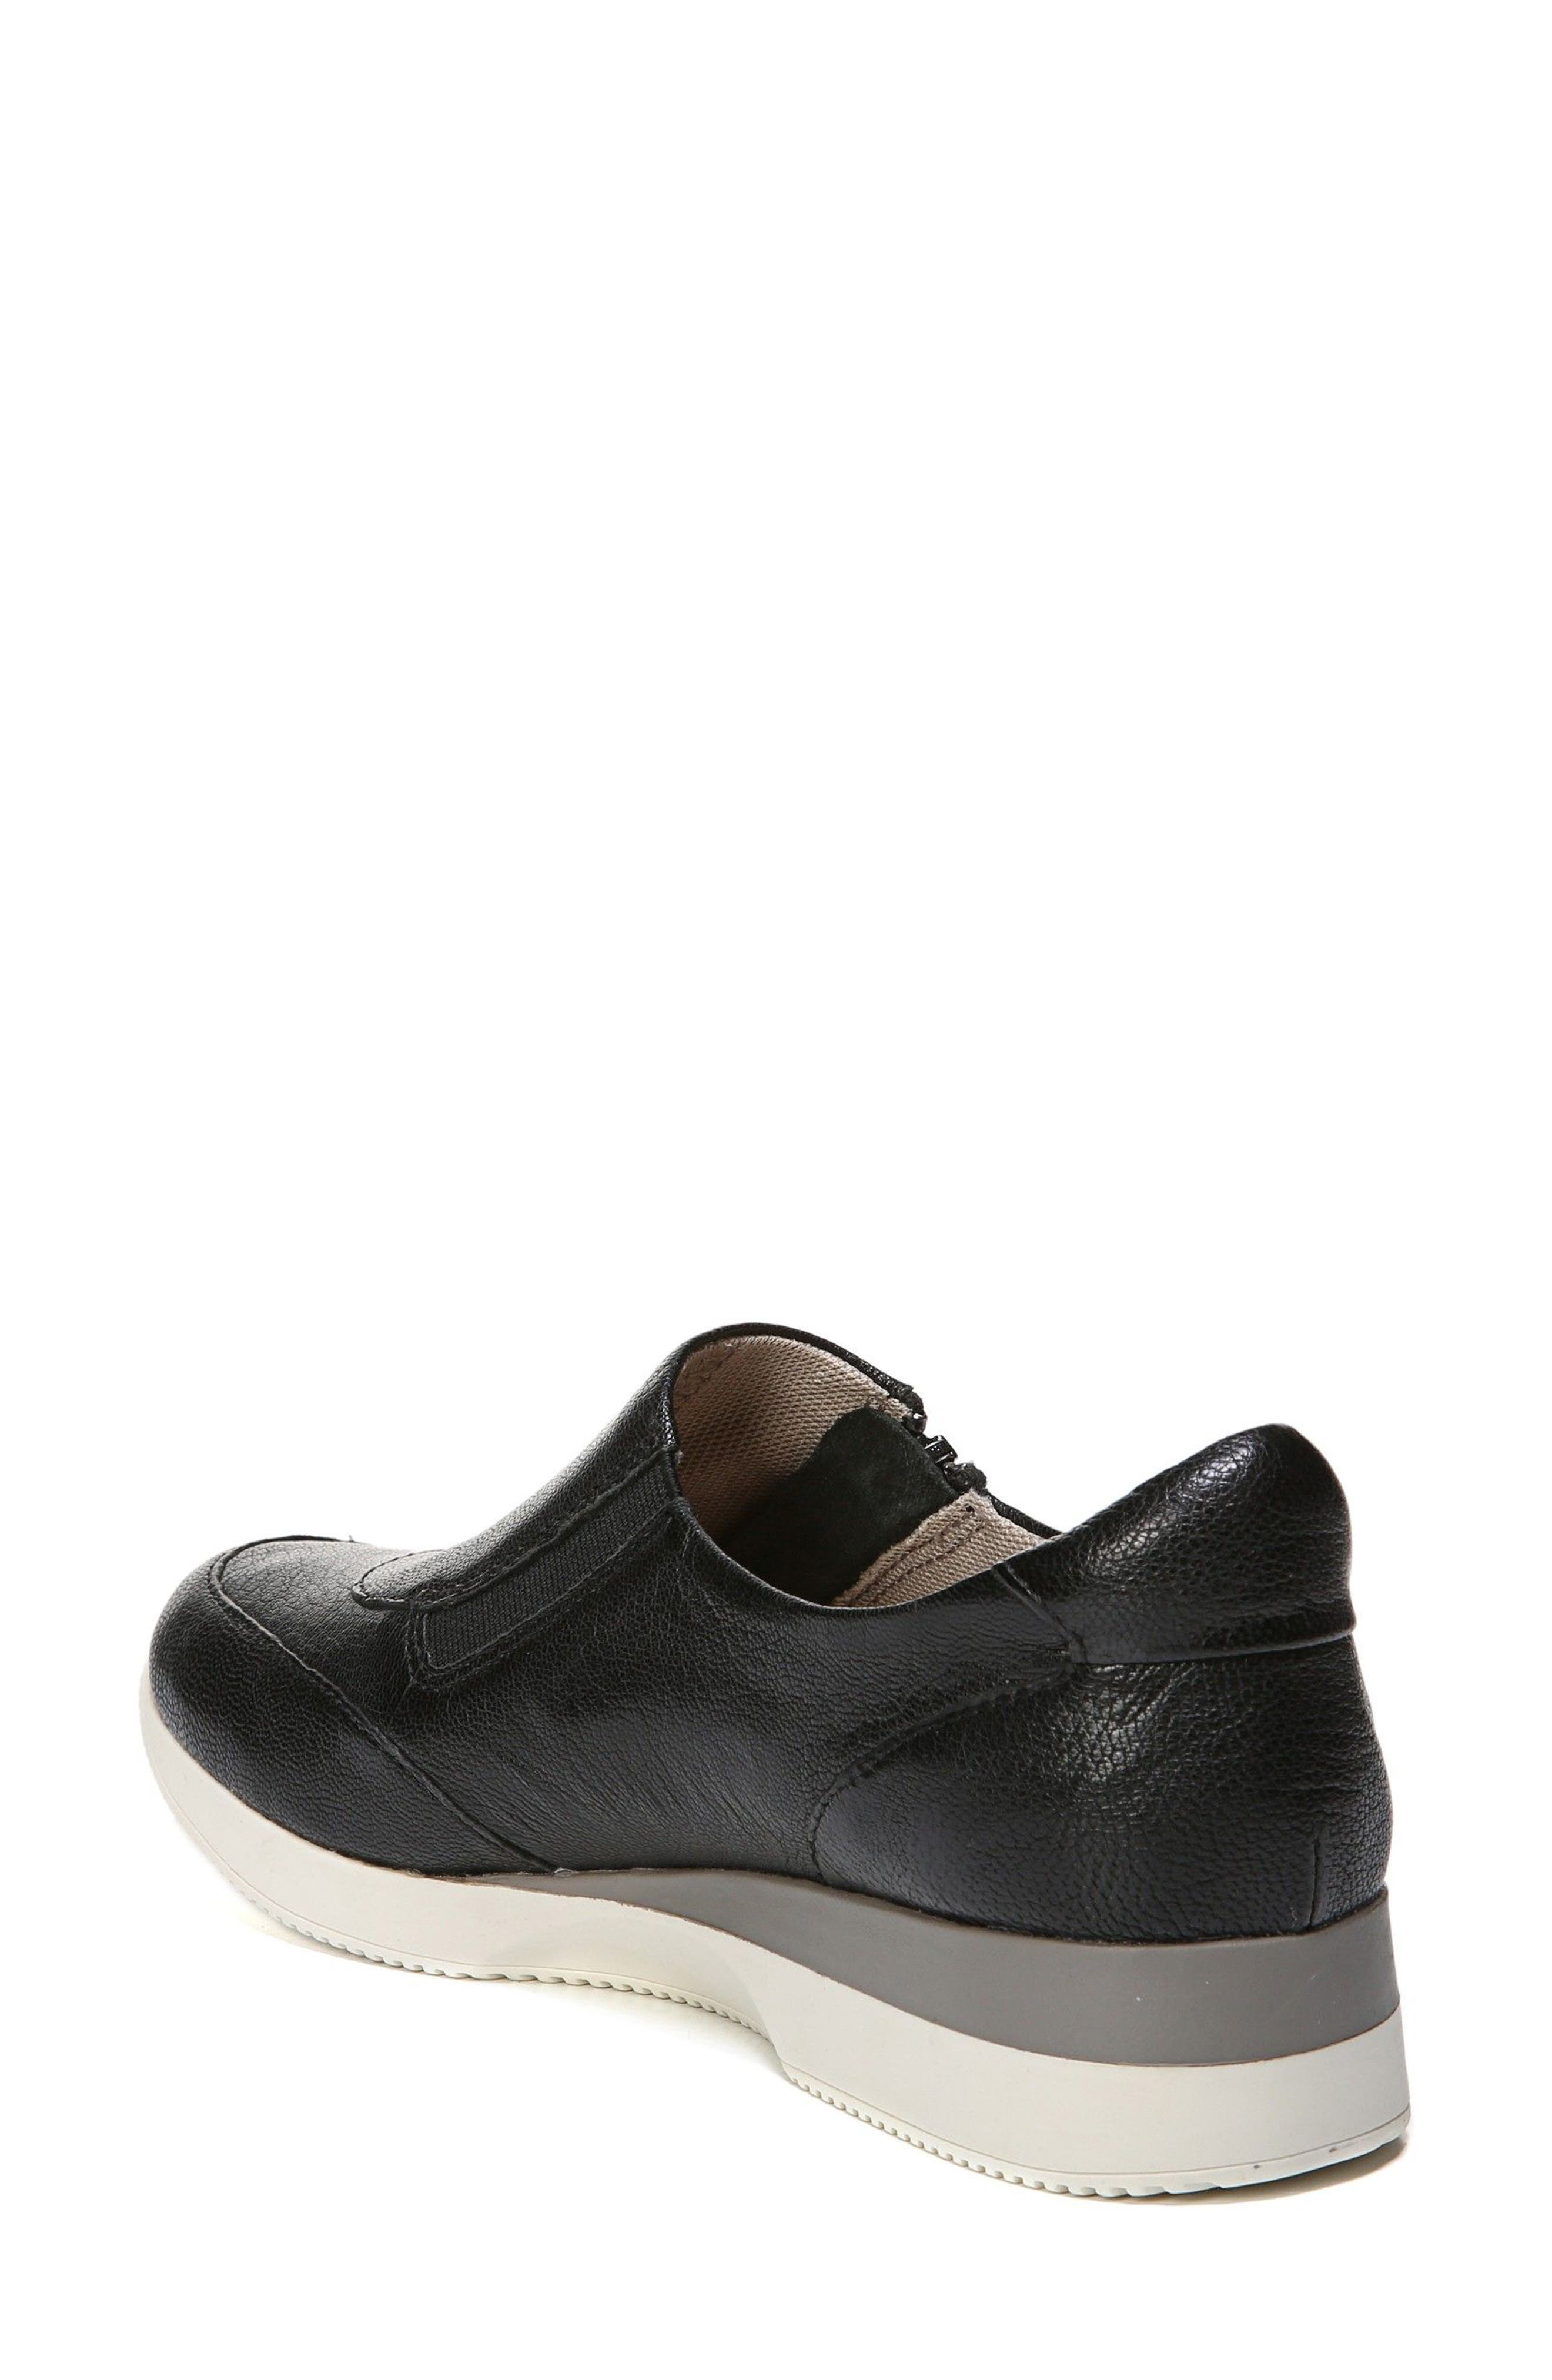 Jetty Sneaker,                             Alternate thumbnail 2, color,                             001